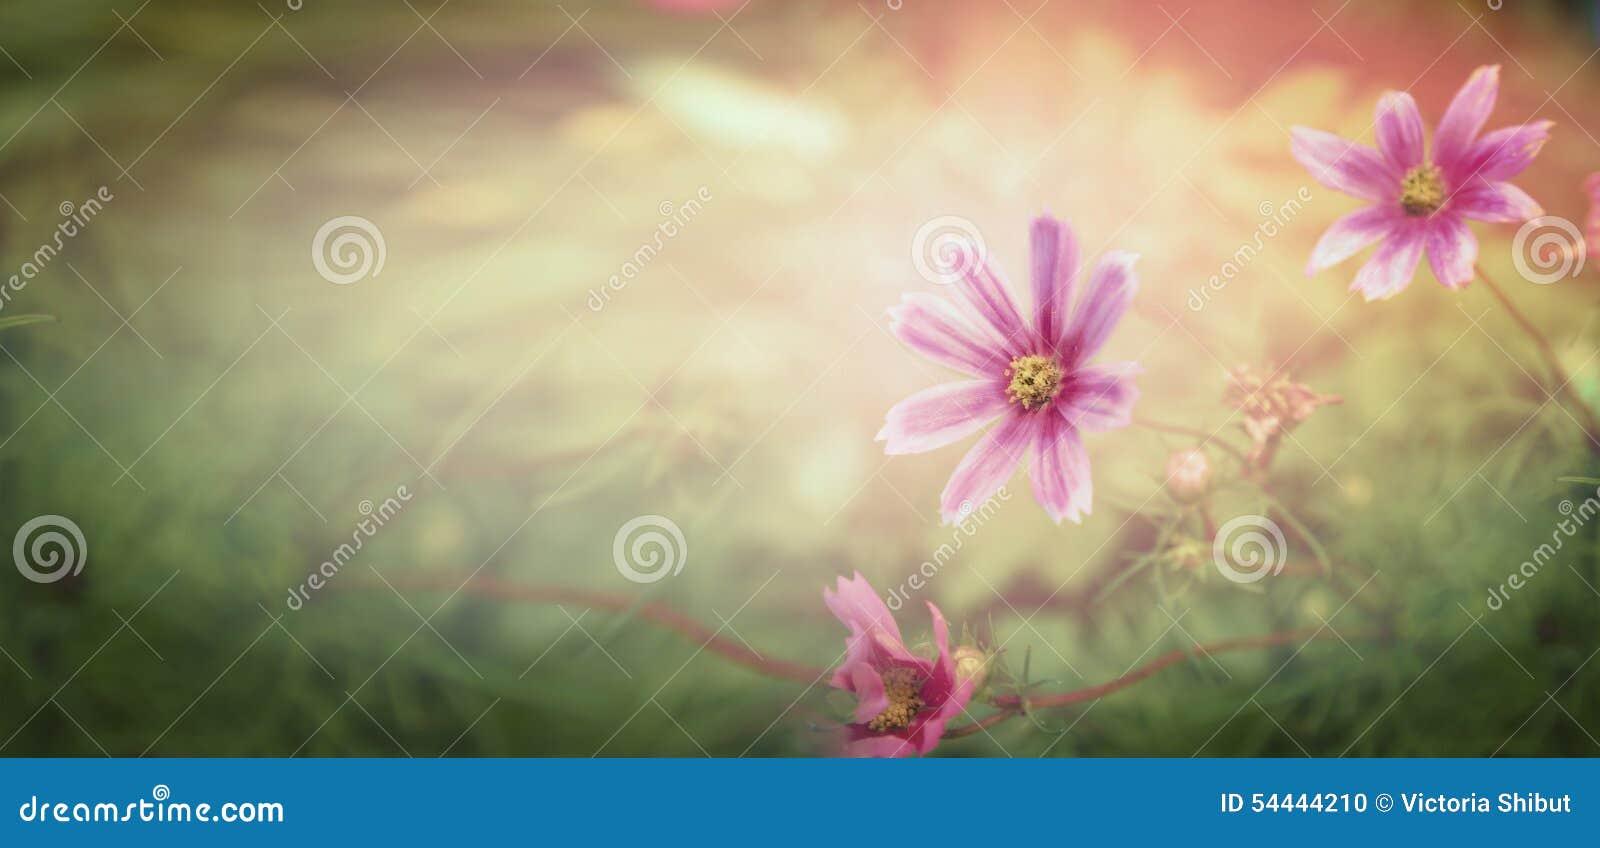 Цветки захода солнца на предпосылке природы, знамени